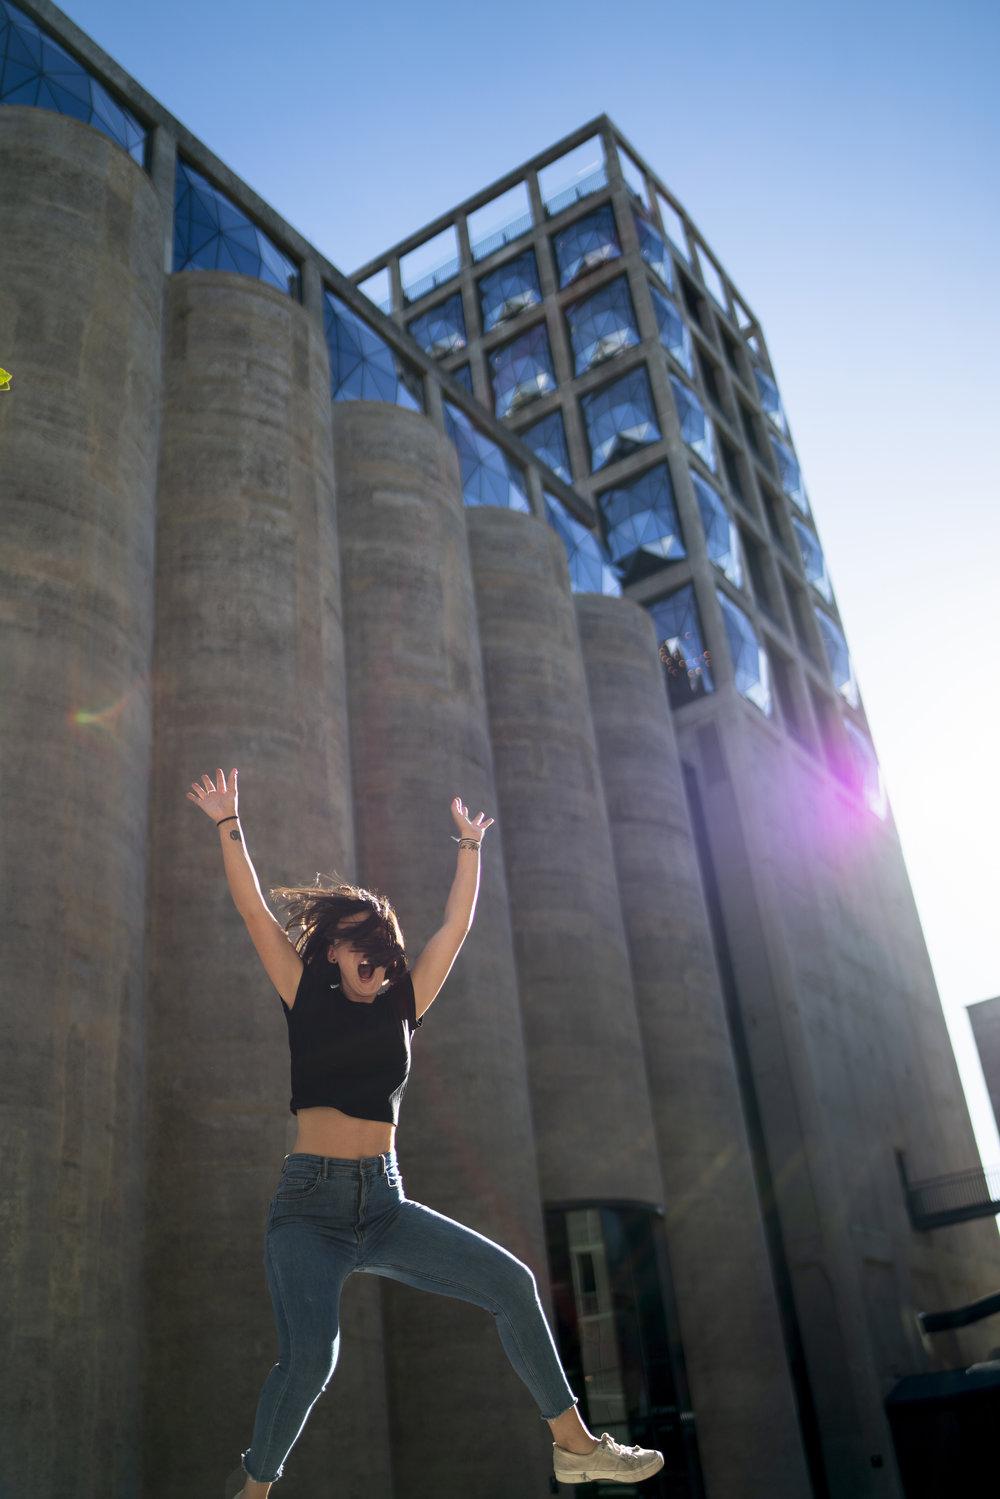 Siloh, Cape Town - SA - Edited in Photoshop